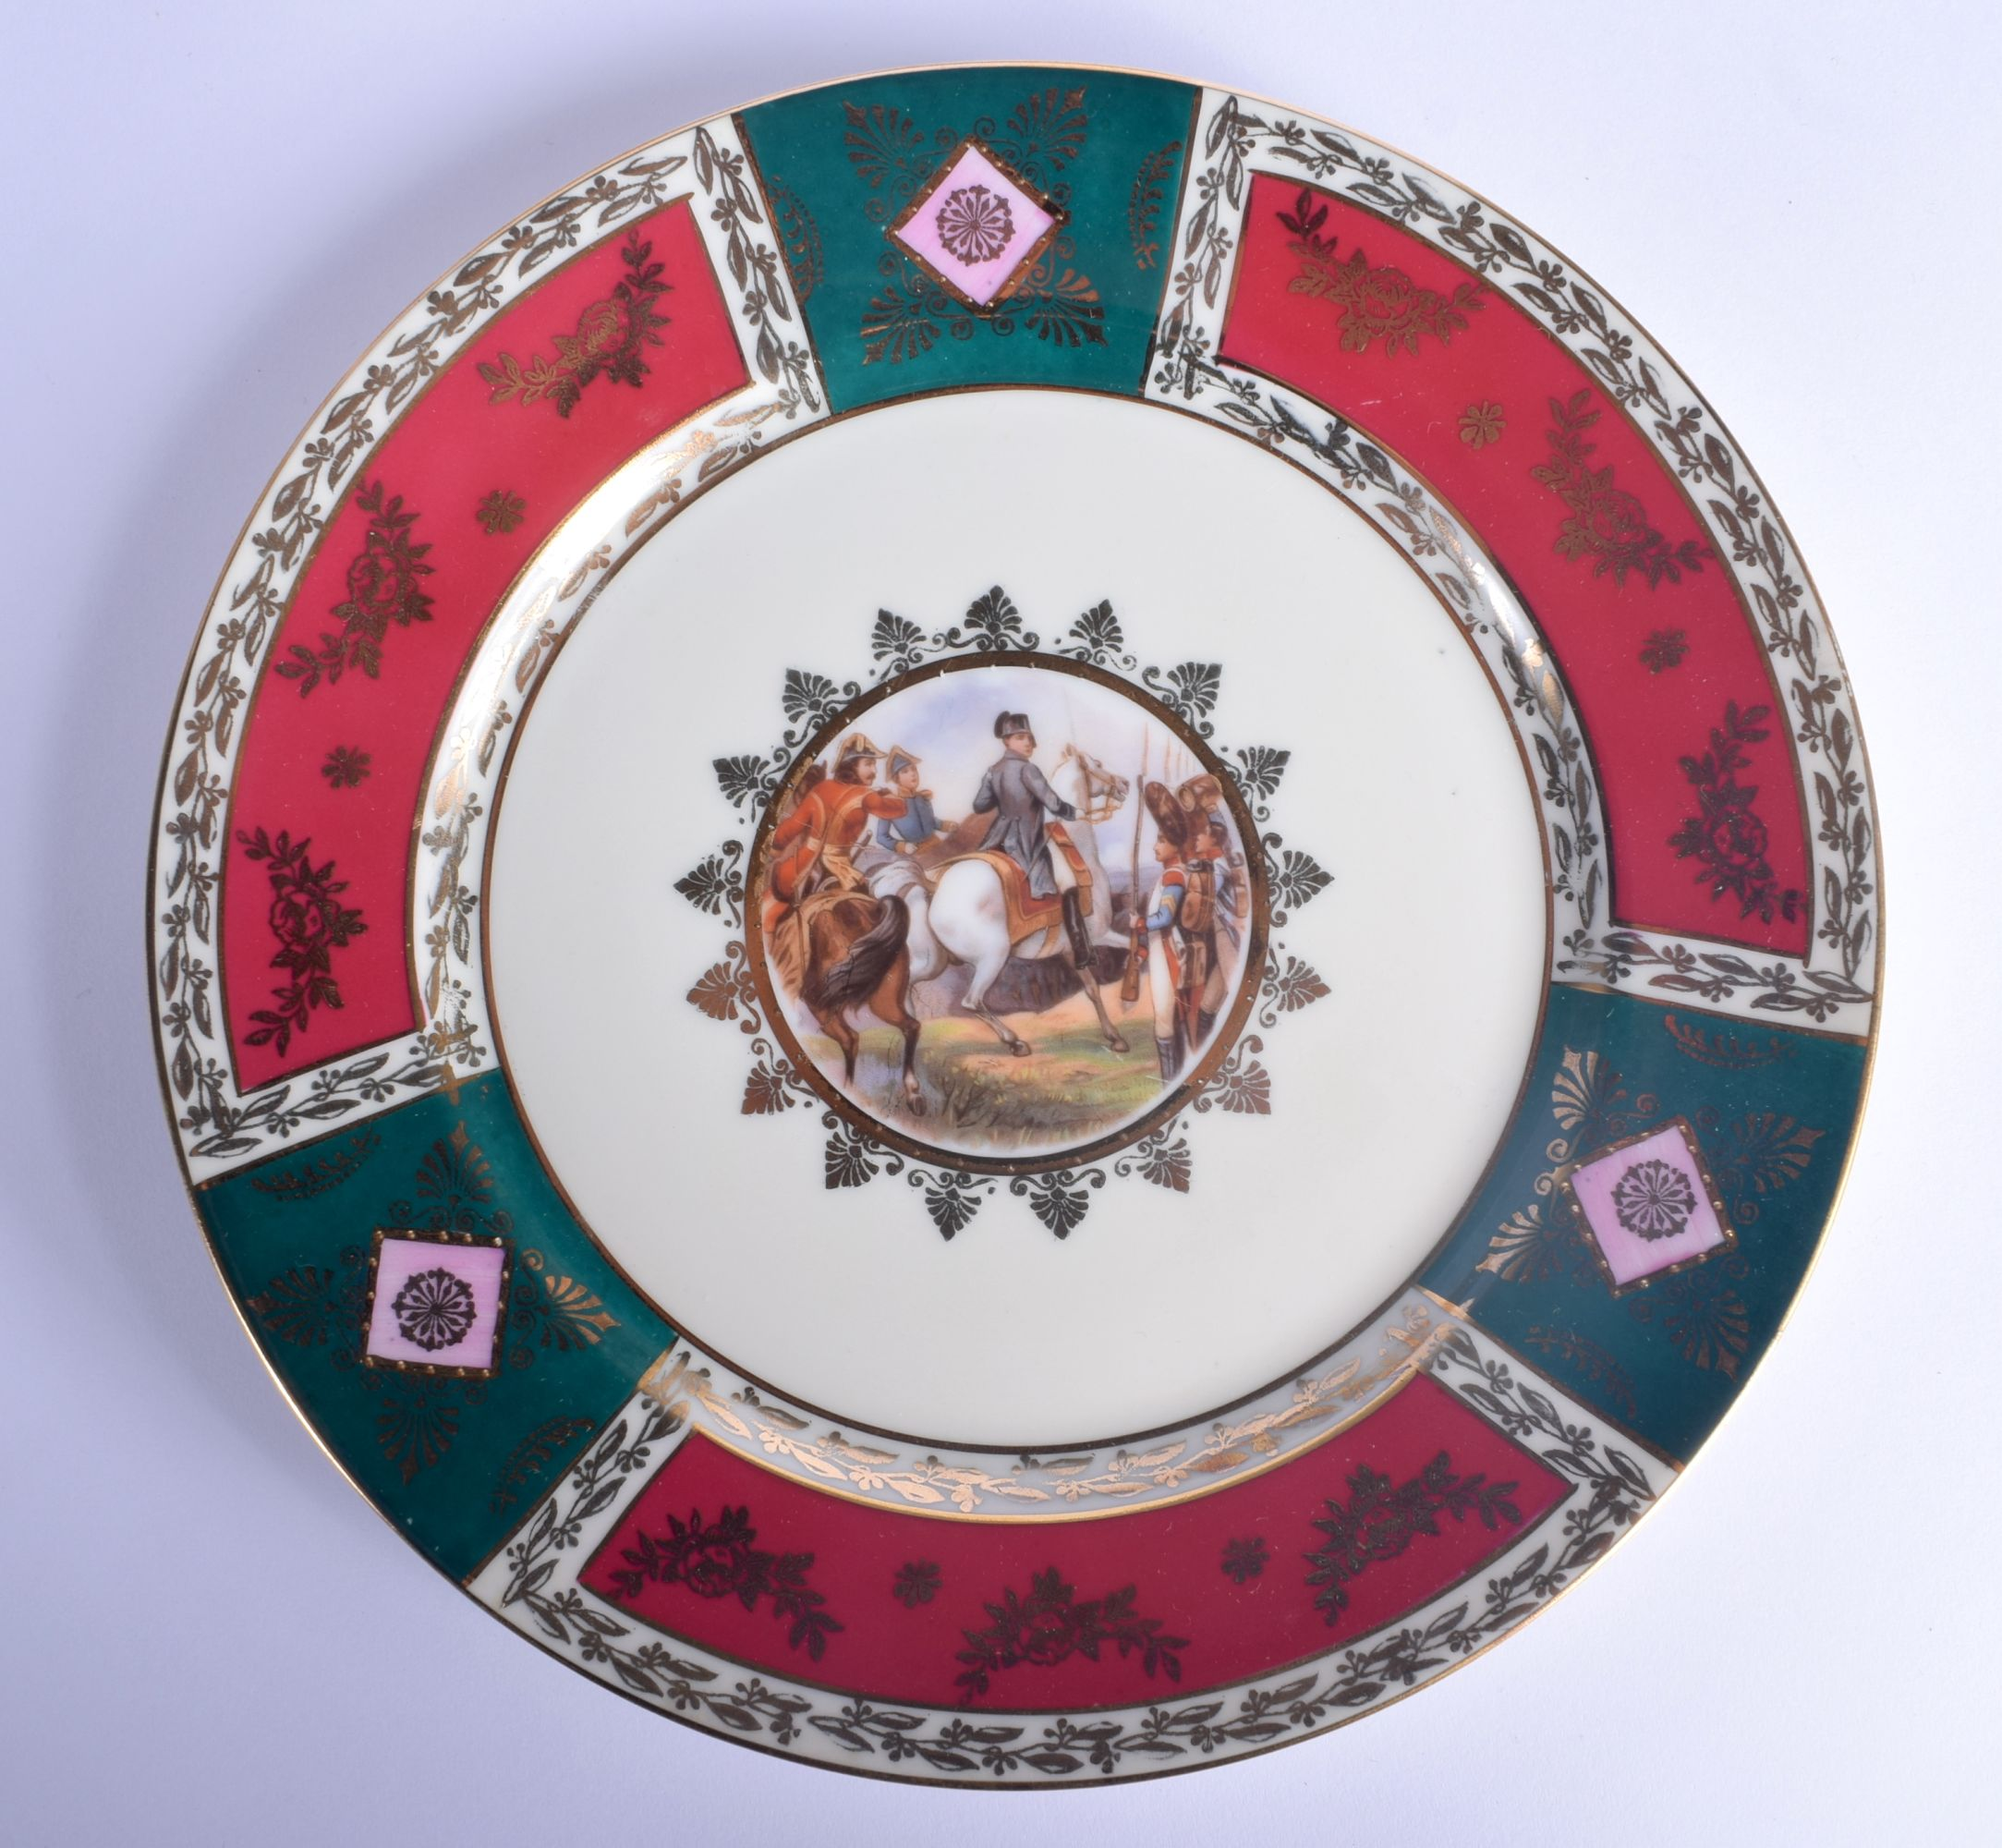 A VINTAGE J K CARLSBAD BAVARIA PORCELAIN VIENNA STYLE TEASET decorated with Napoleonic scenes. Large - Image 2 of 22